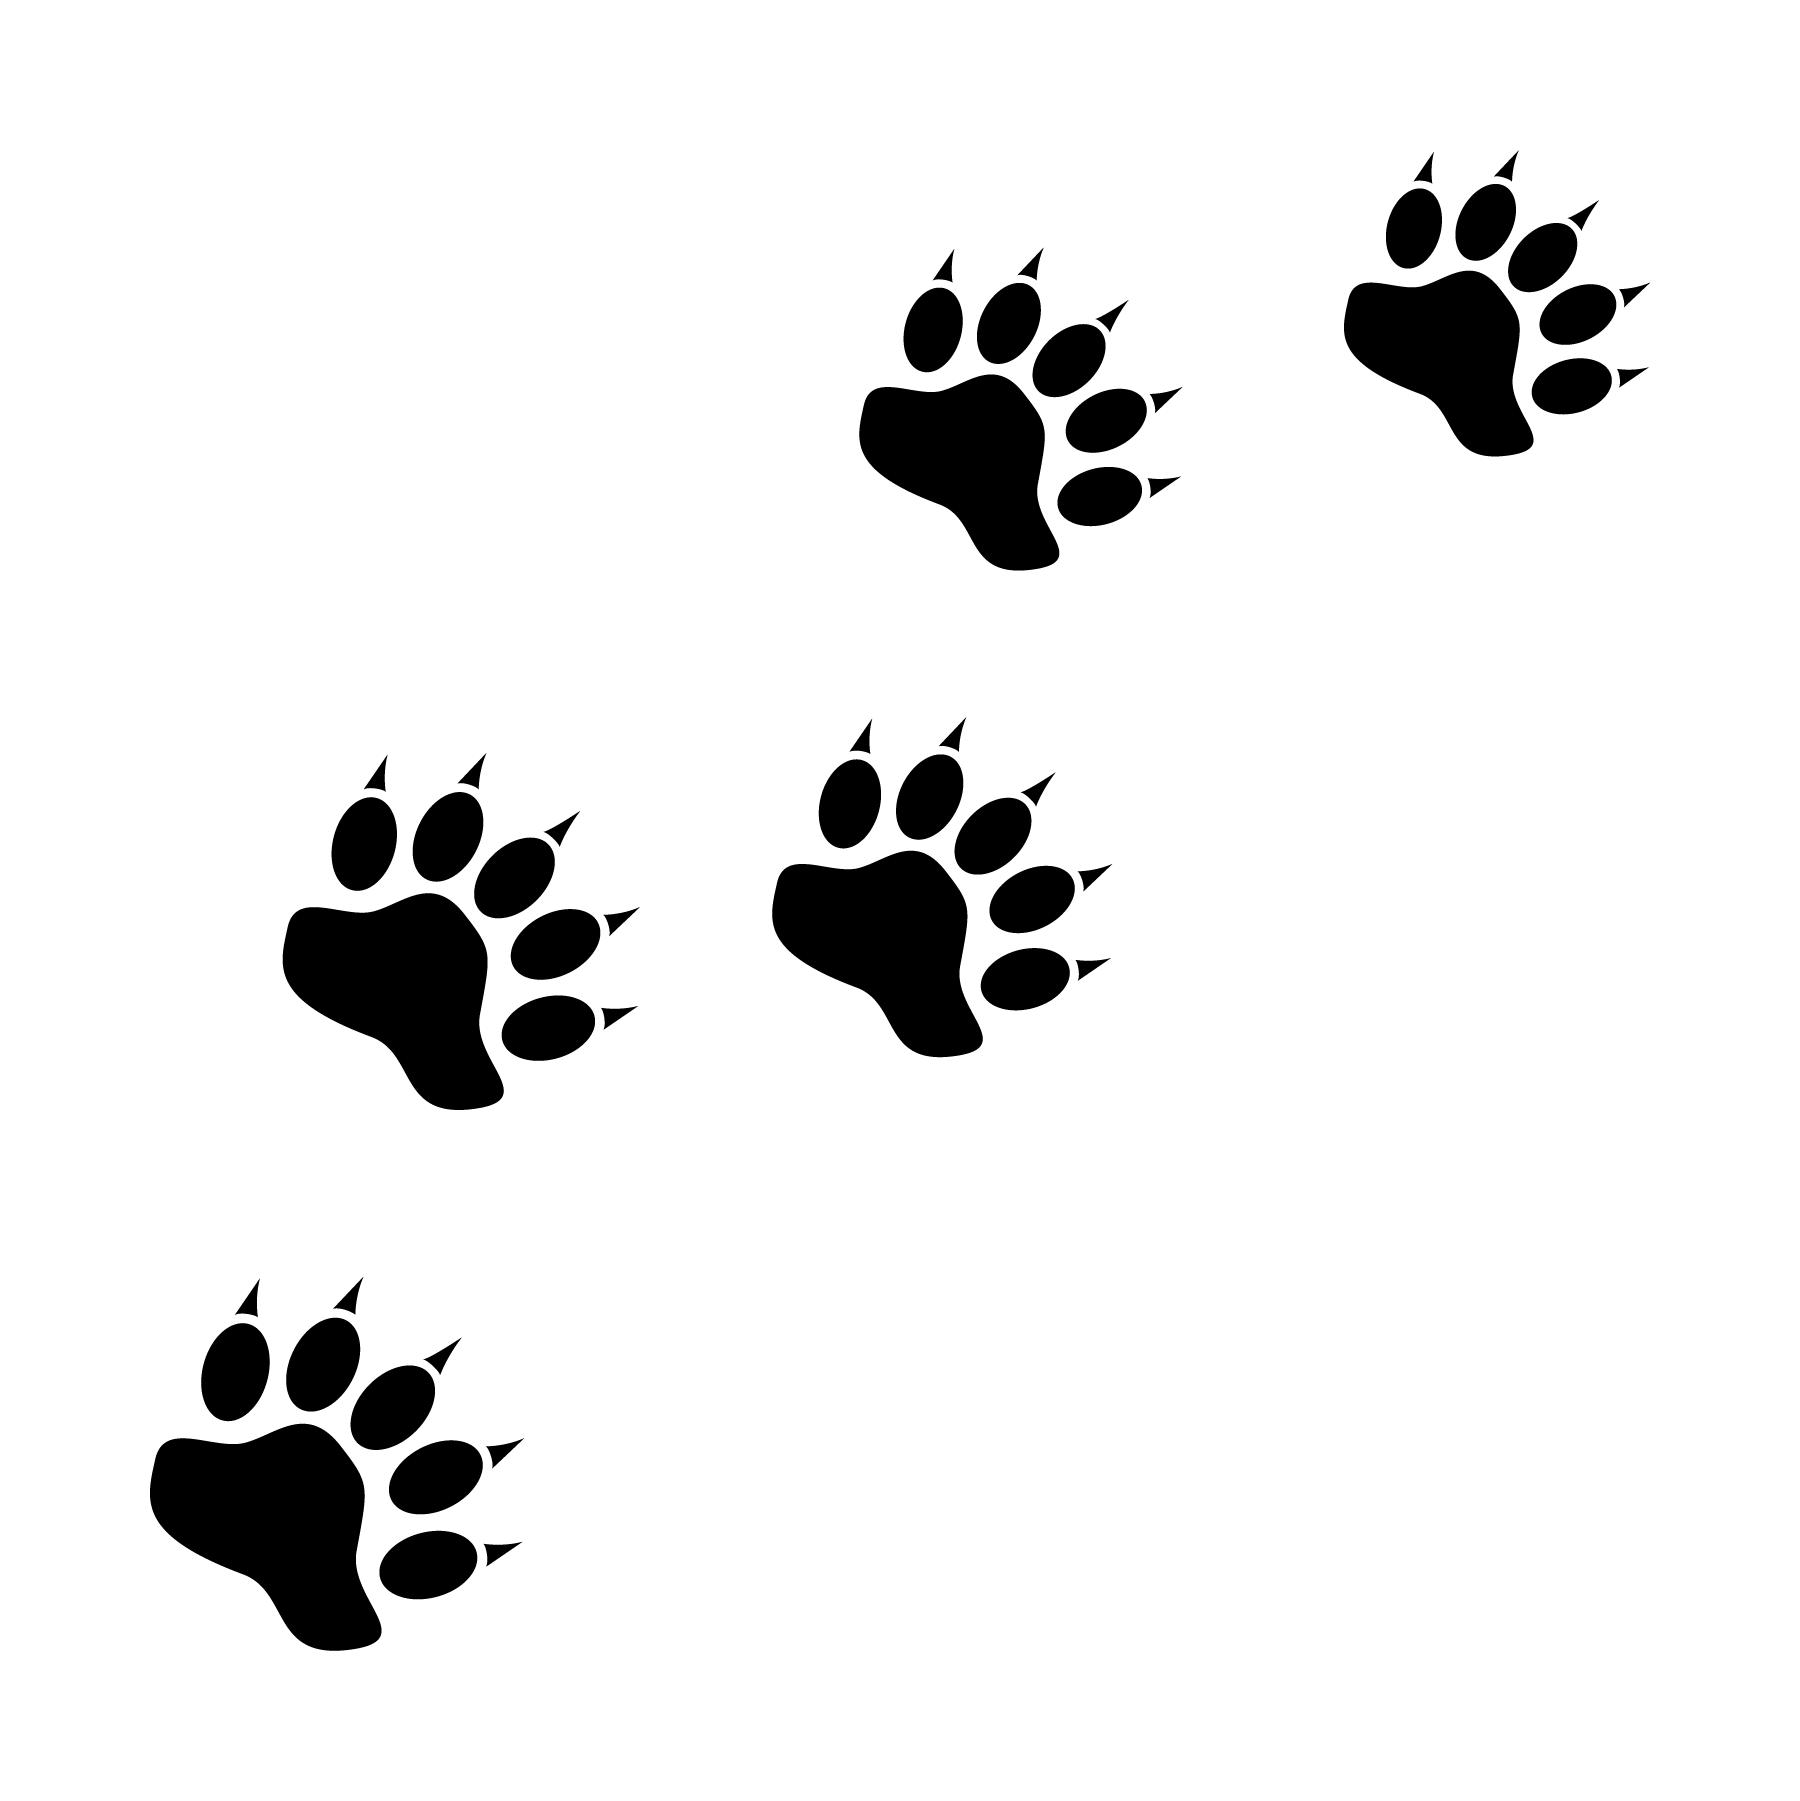 Bear Paw Print Icons Jessicabarrondesigns Design Graphicdesign Icon Icondesign Adobeillustrator Ai Footprint Pawprint Bear Artoftheday Vector Vect